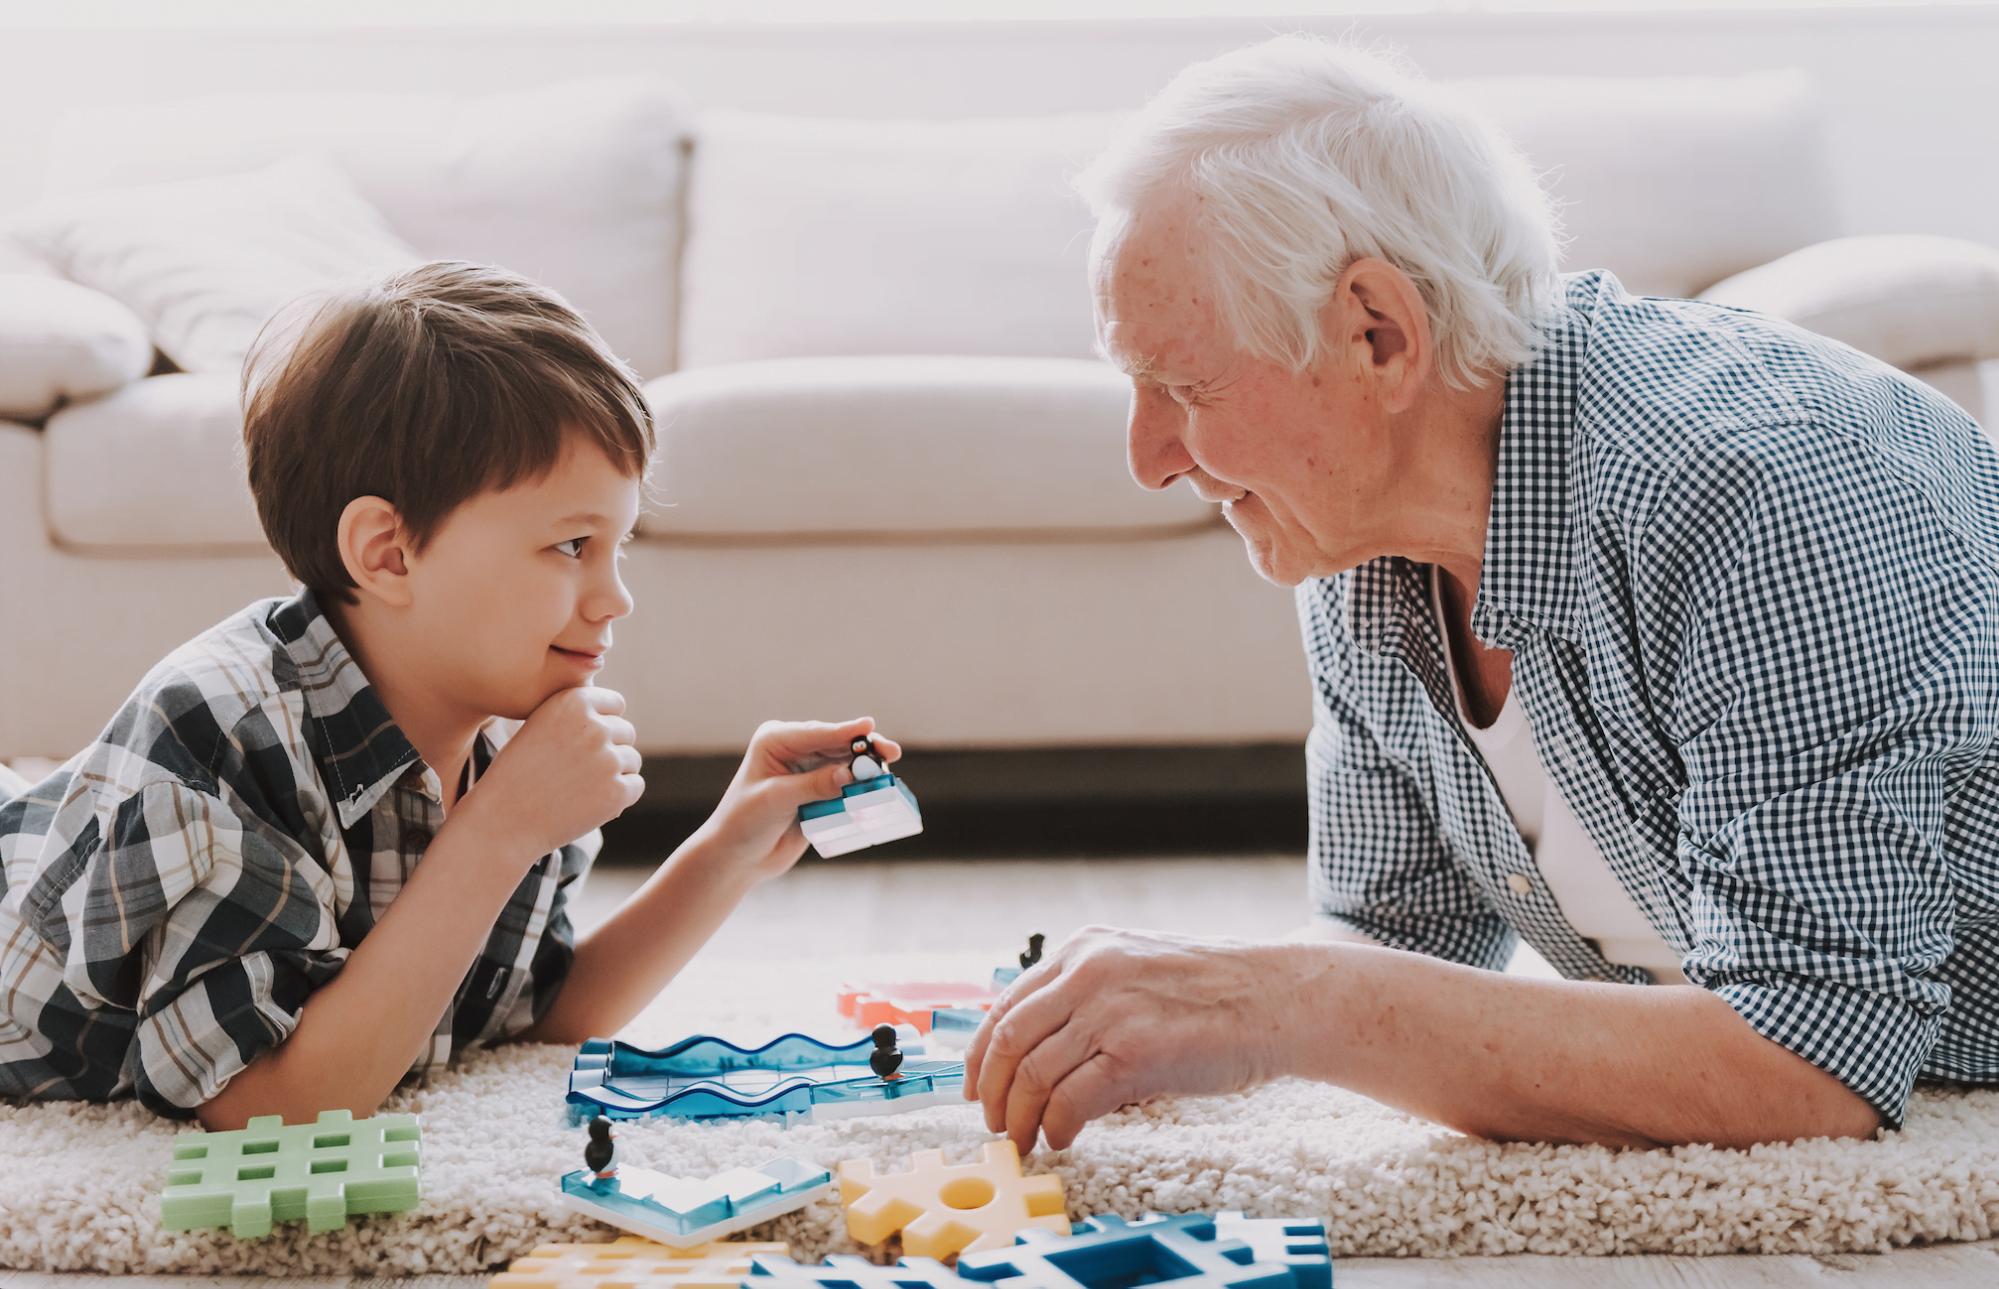 grandpa play with kid